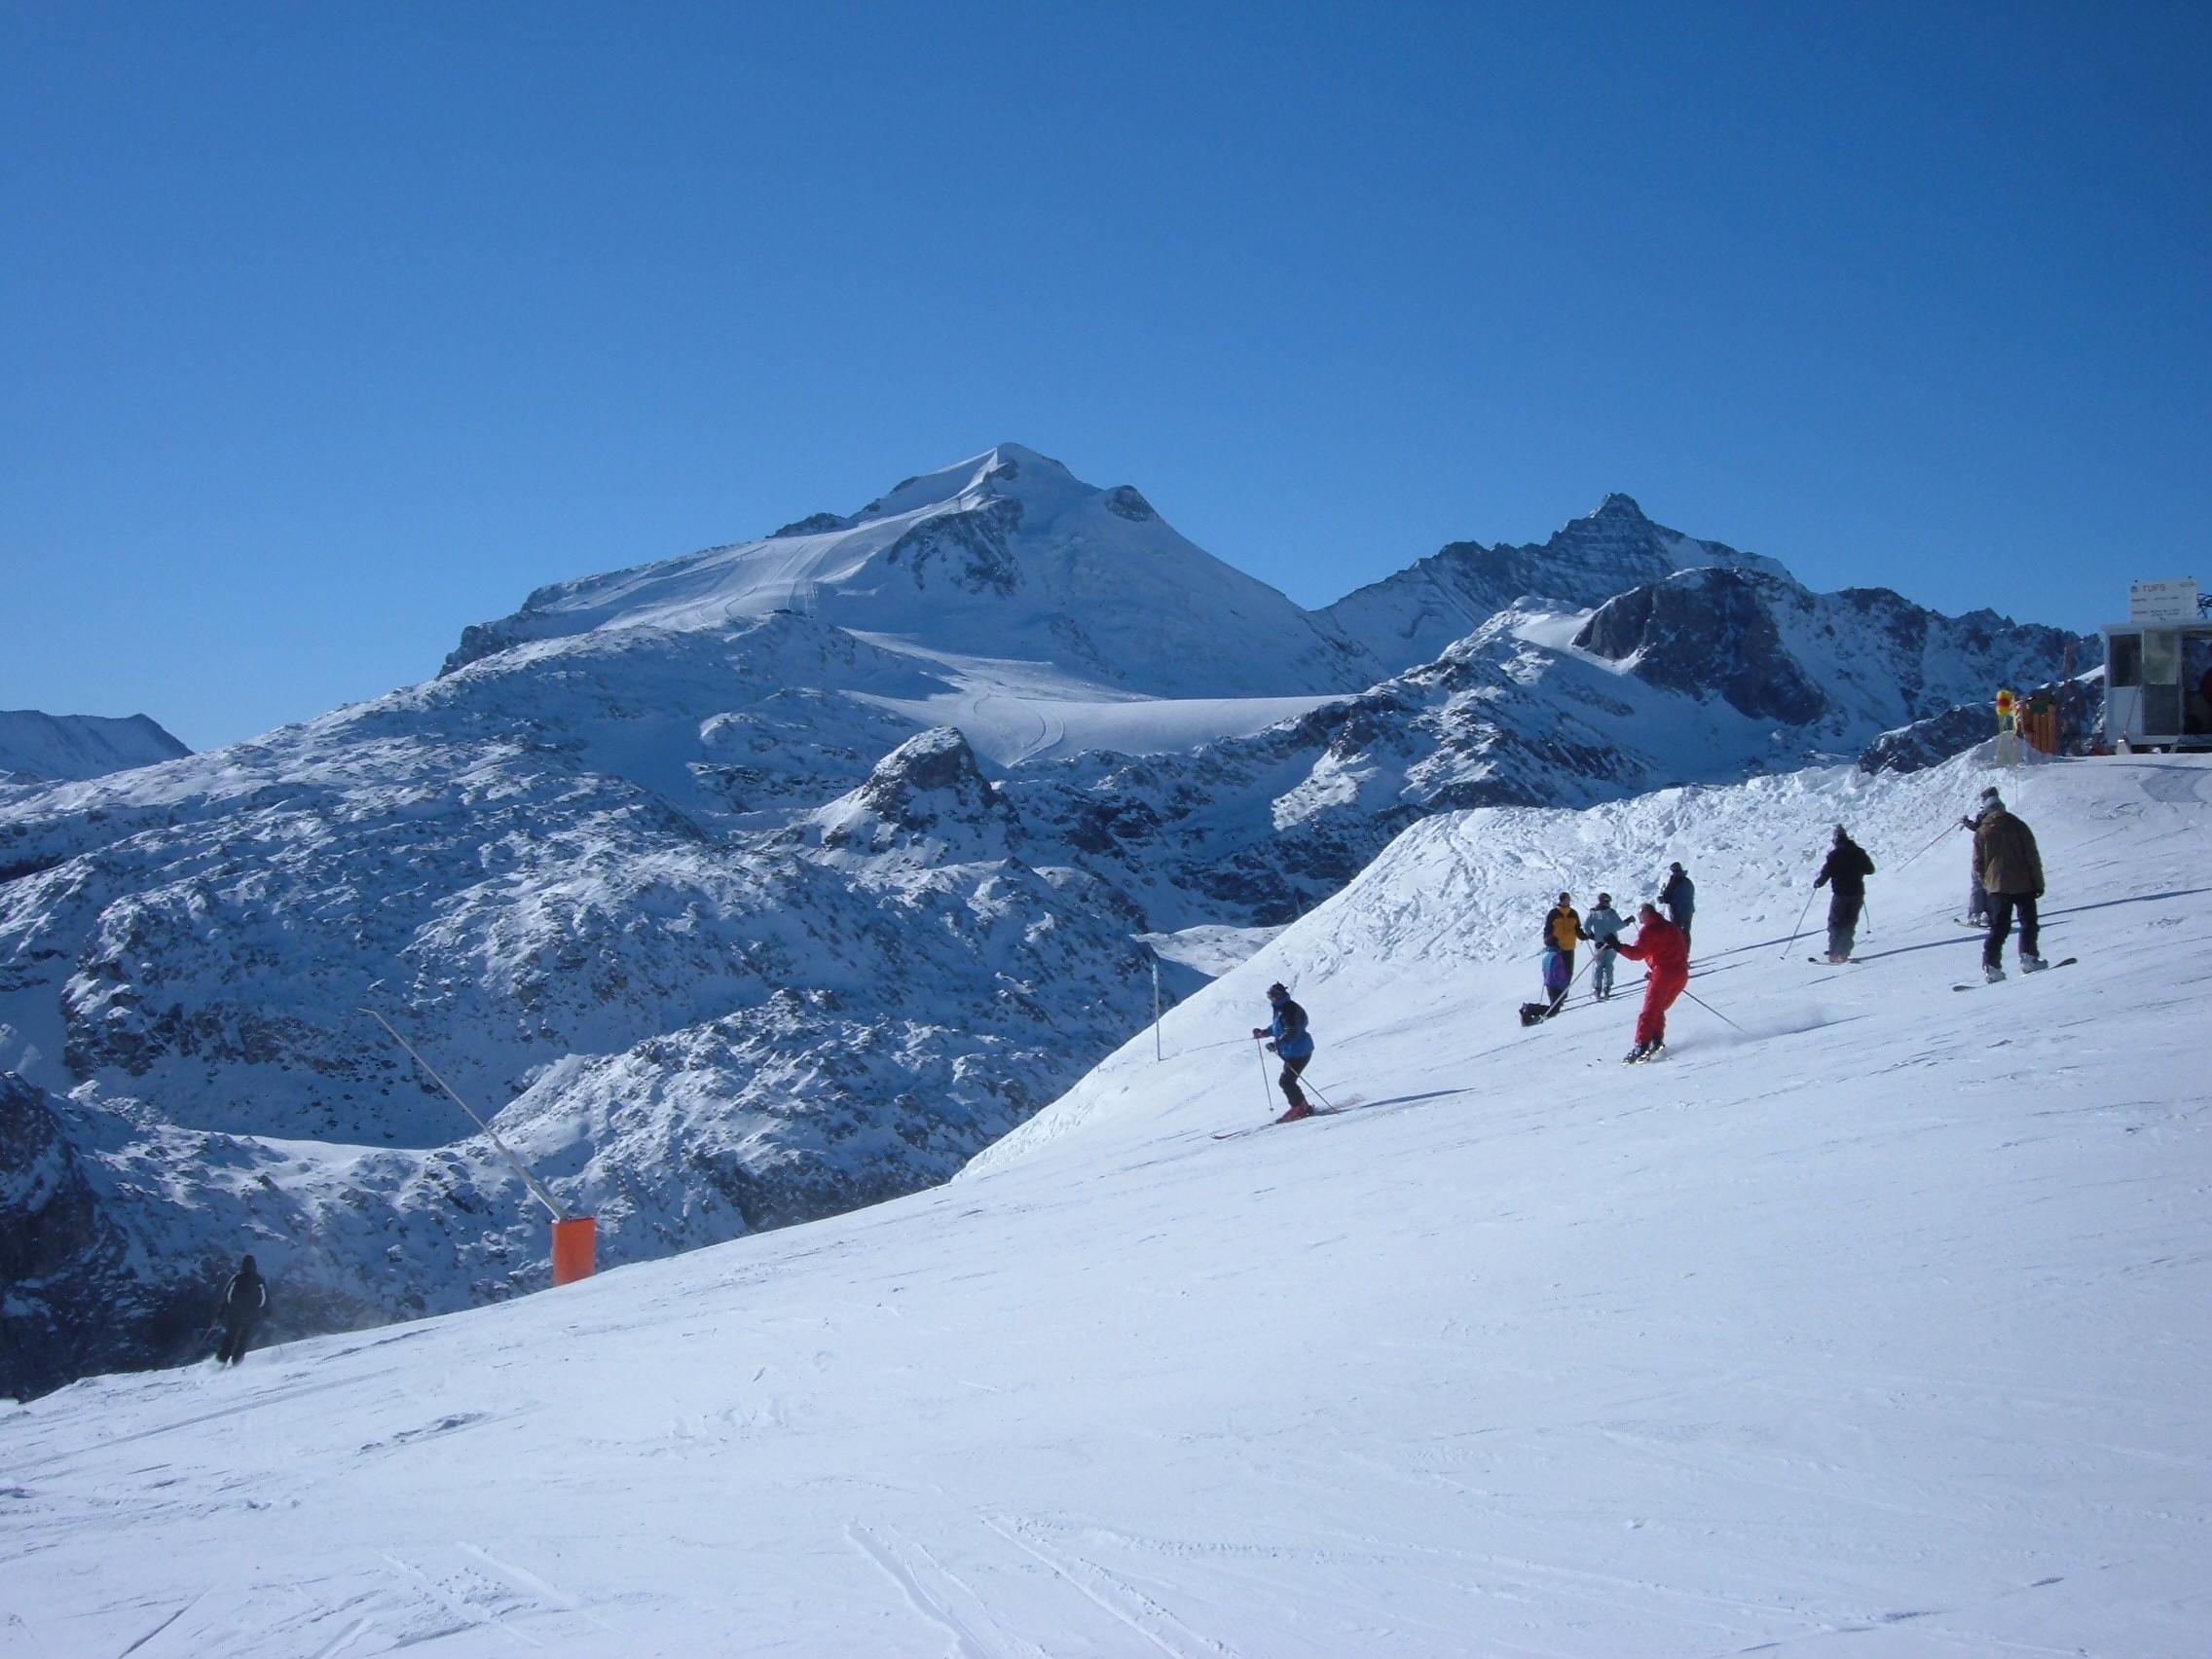 Dolomiti Superski Bumps On The Road